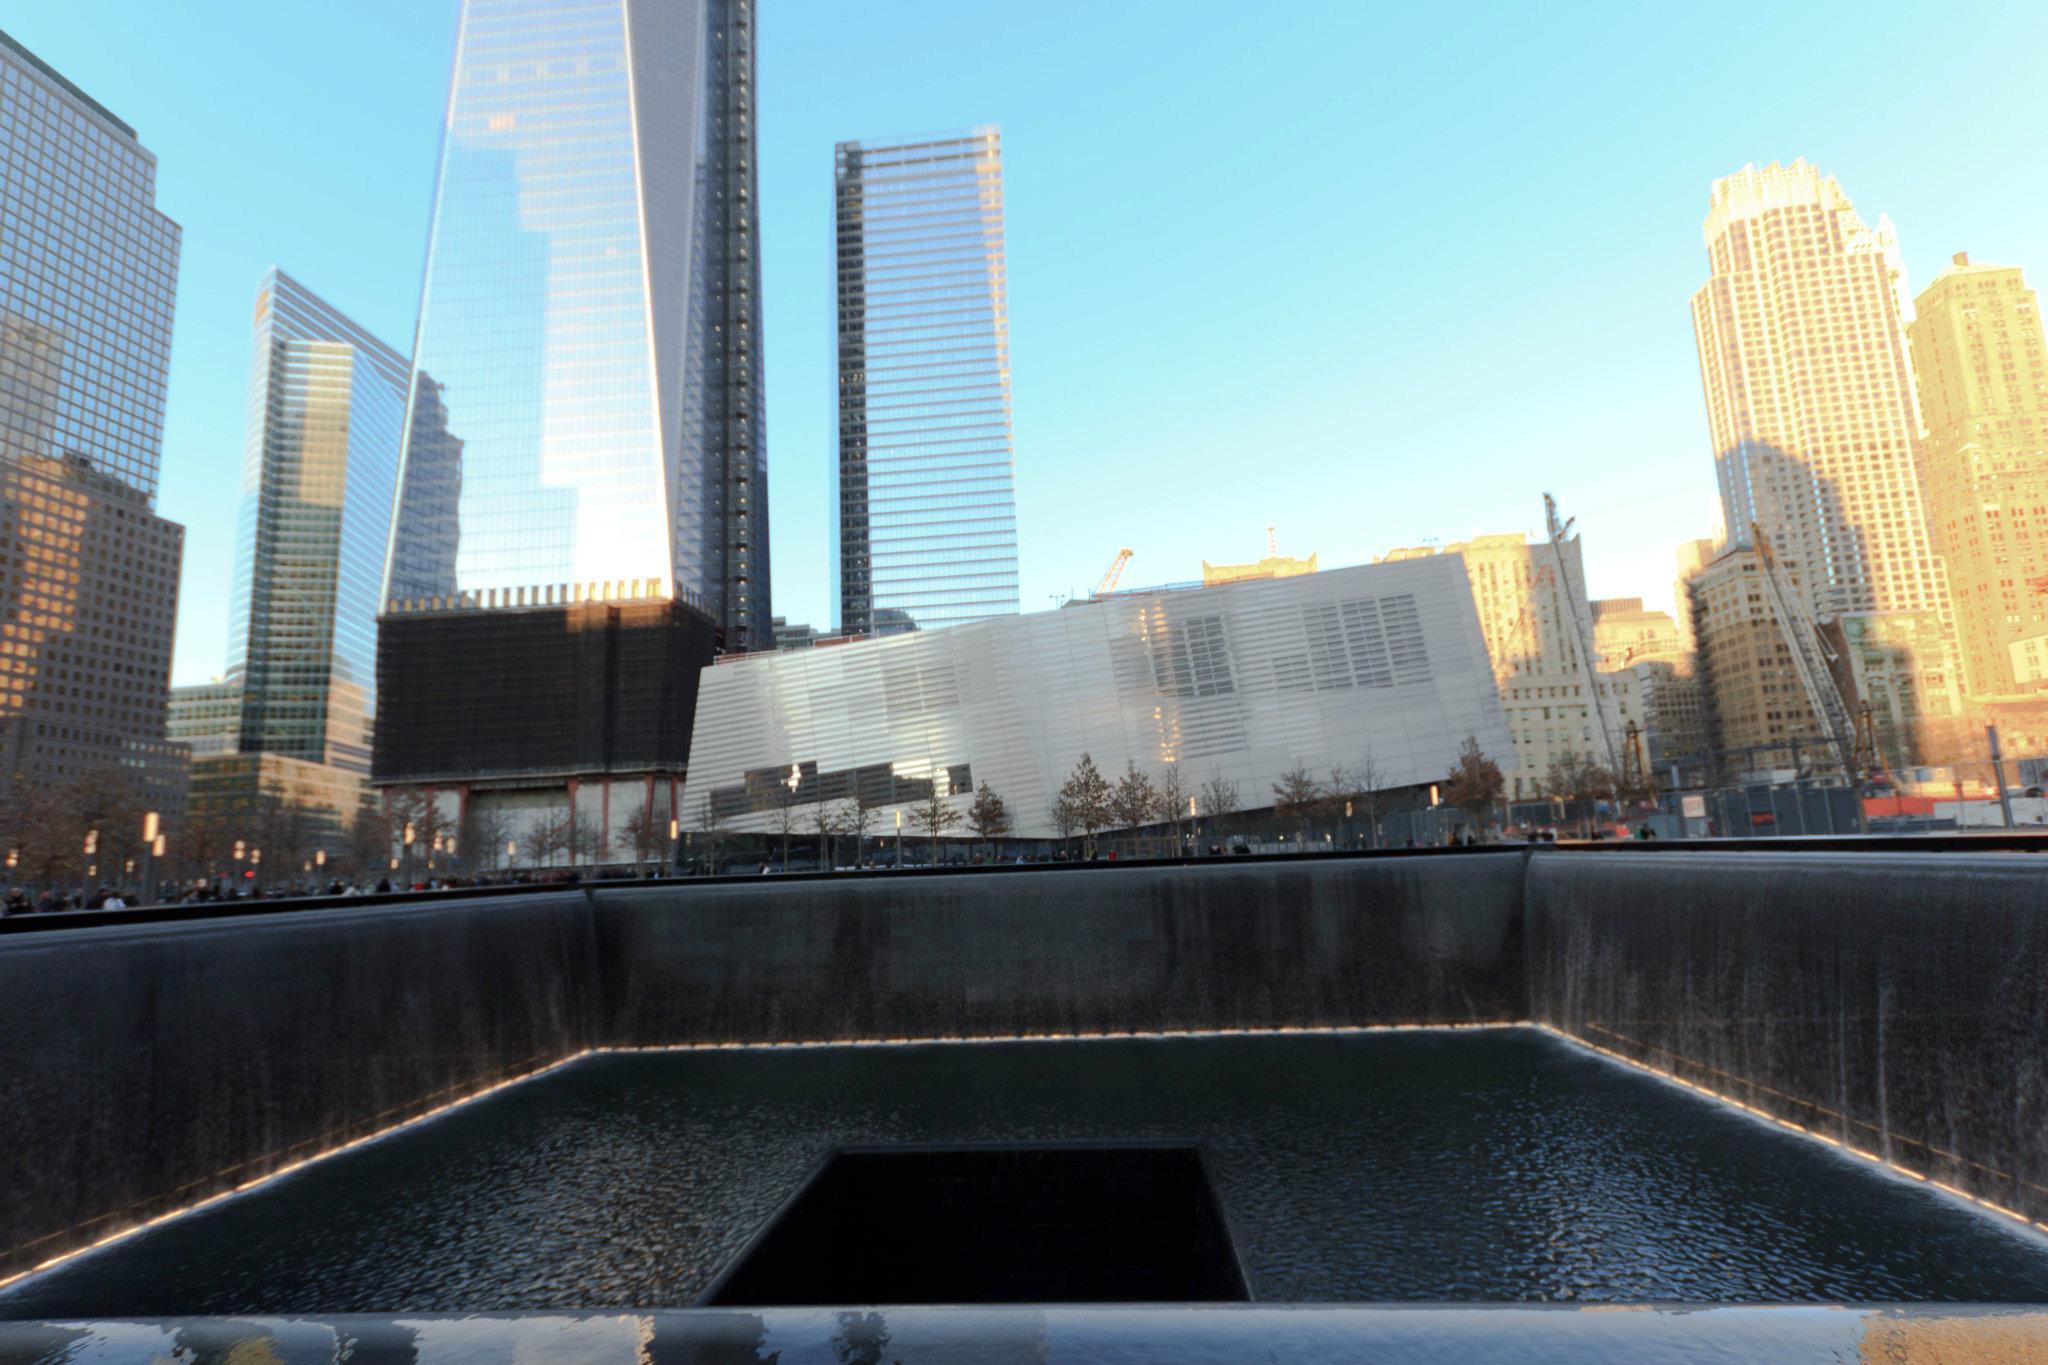 New York Sehenswürdigkeiten: WTCS 9/11 Memorial